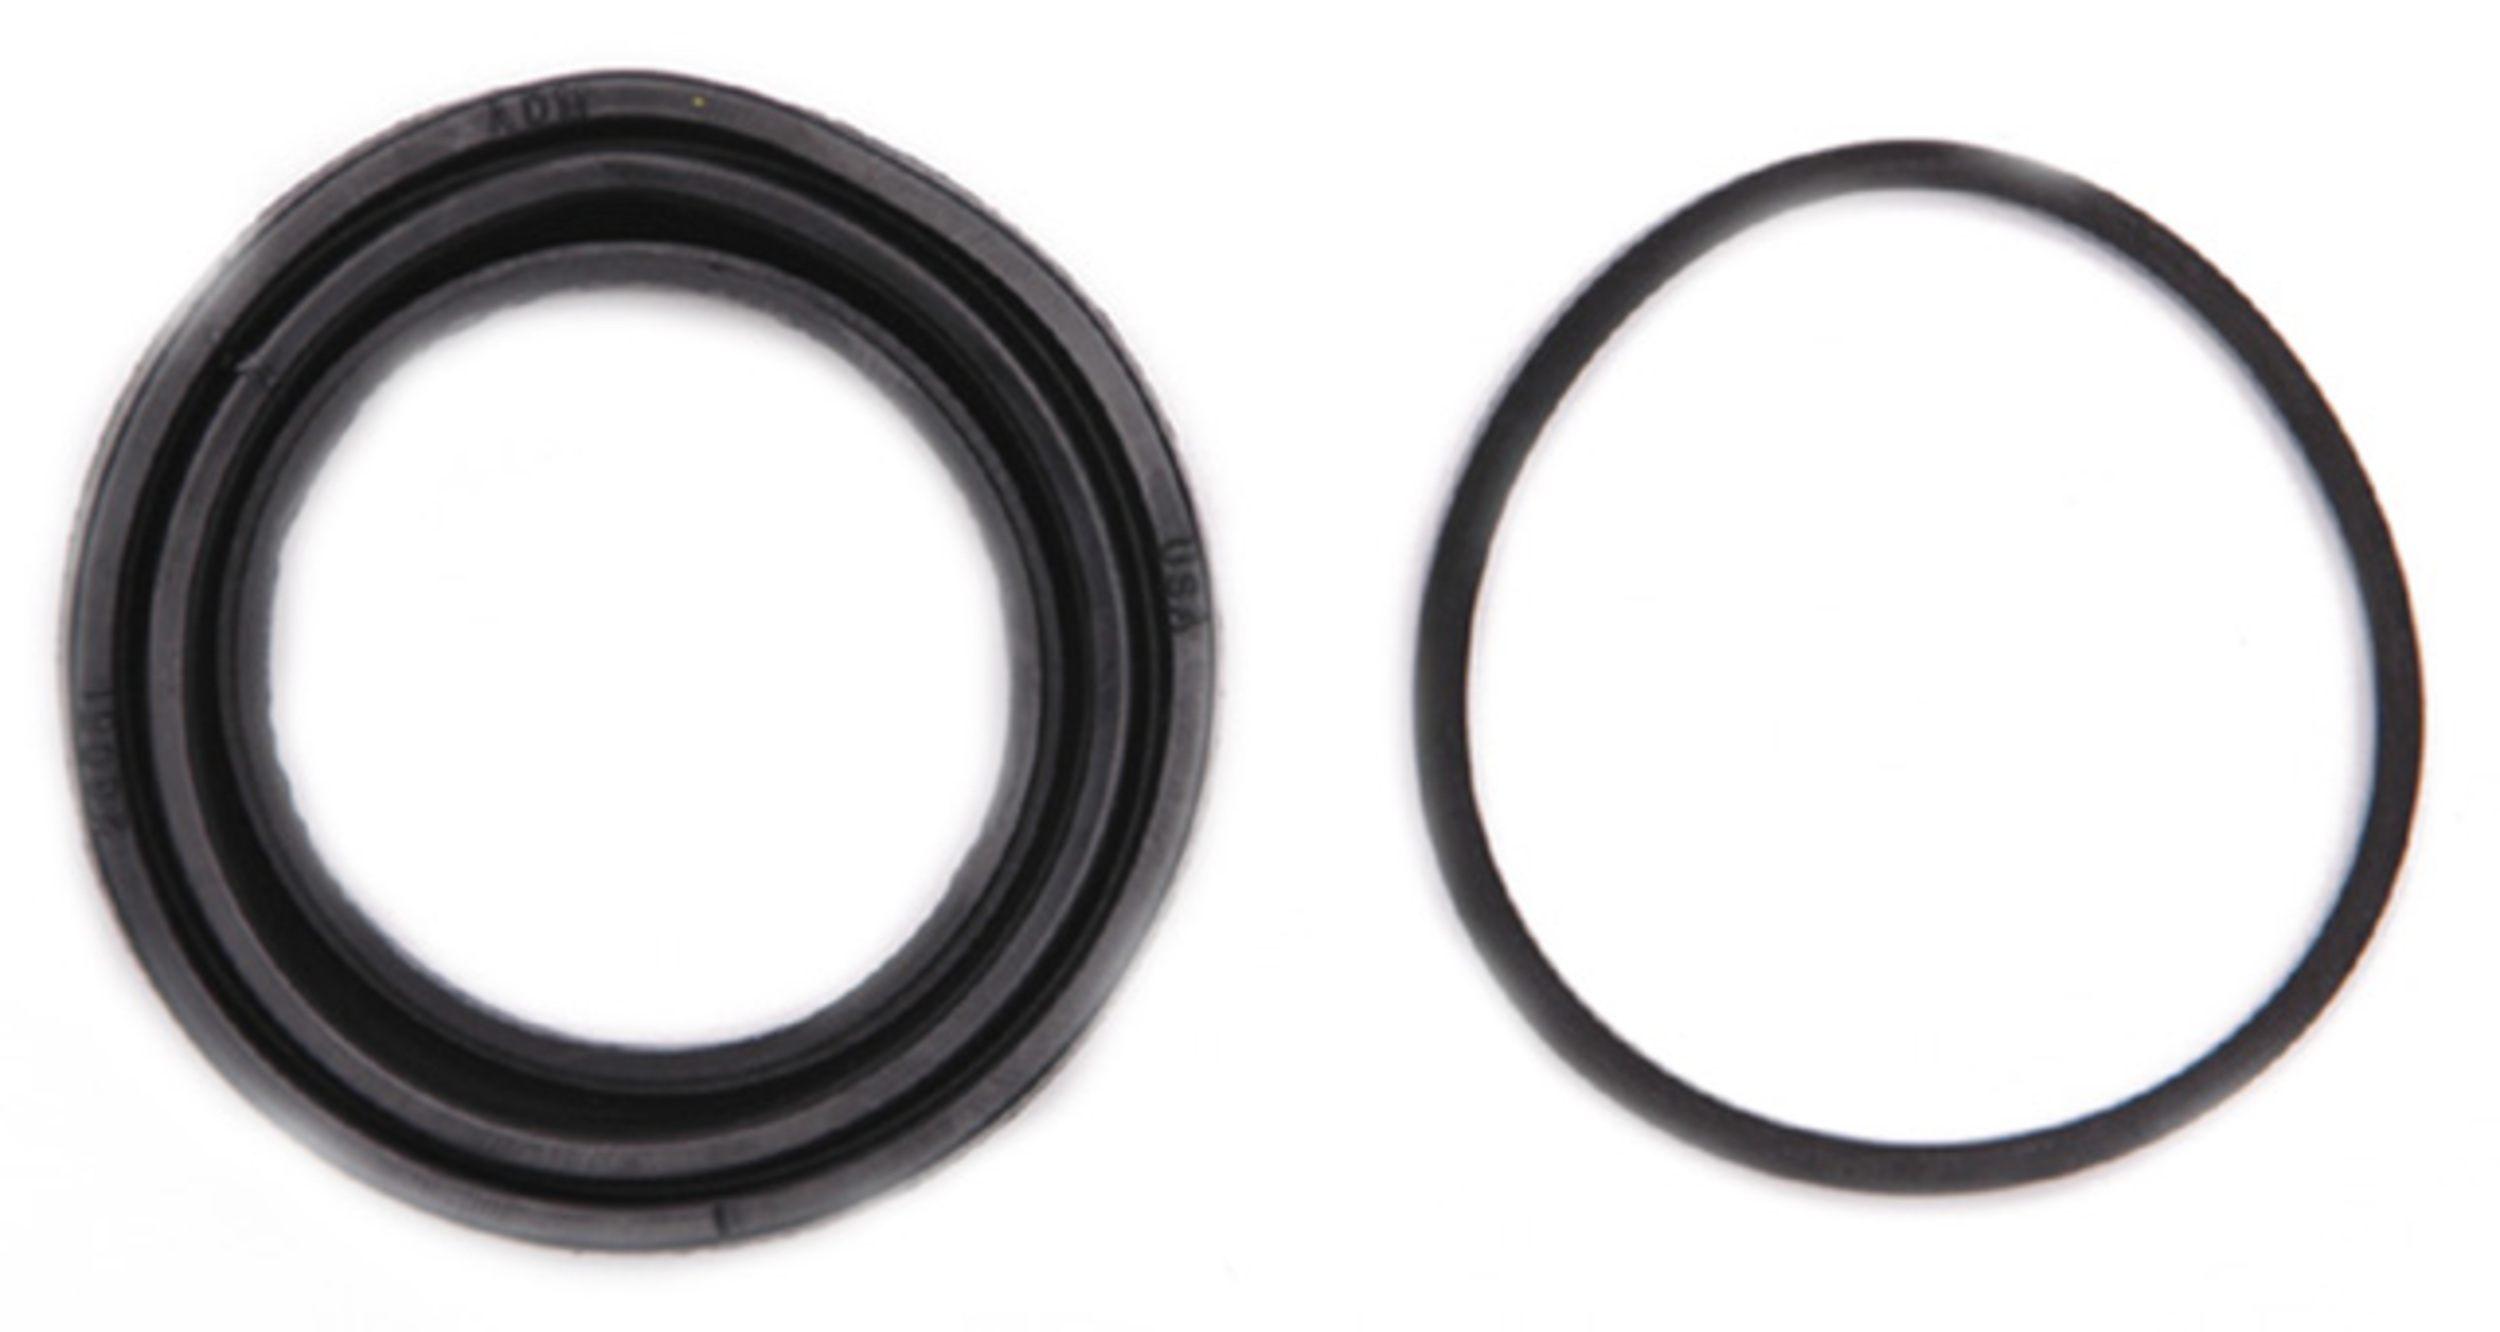 ACDELCO PROFESSIONAL BRAKES - Disc Brake Caliper Seal Kit - ADU 18H2020